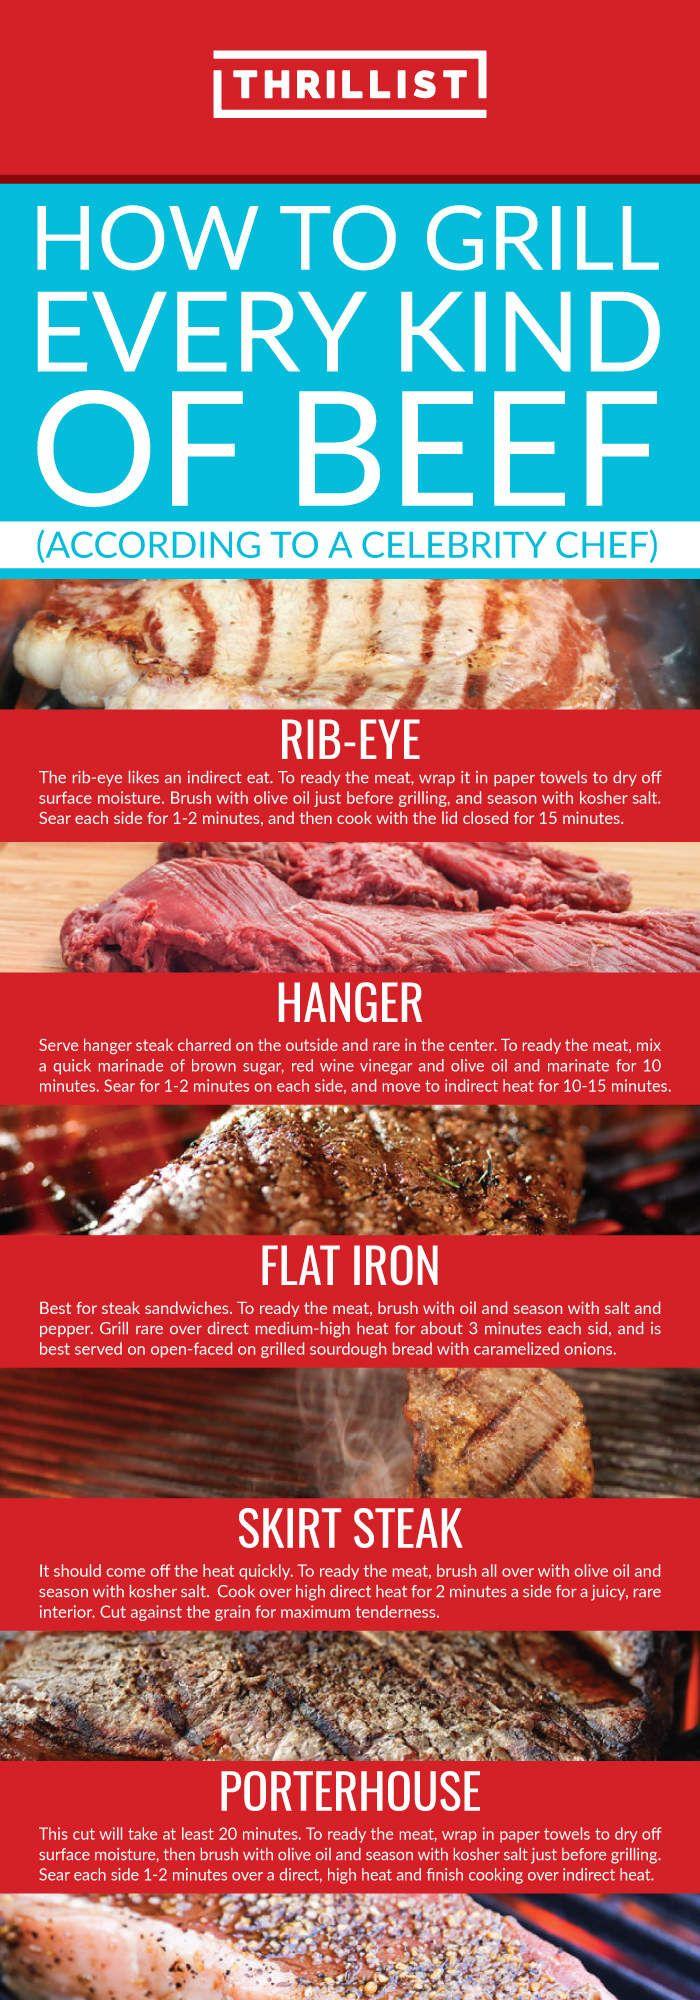 How to Grill Steak & Types of Beef, With Celebrity Chef Elizabeth Karmel - Thrillist